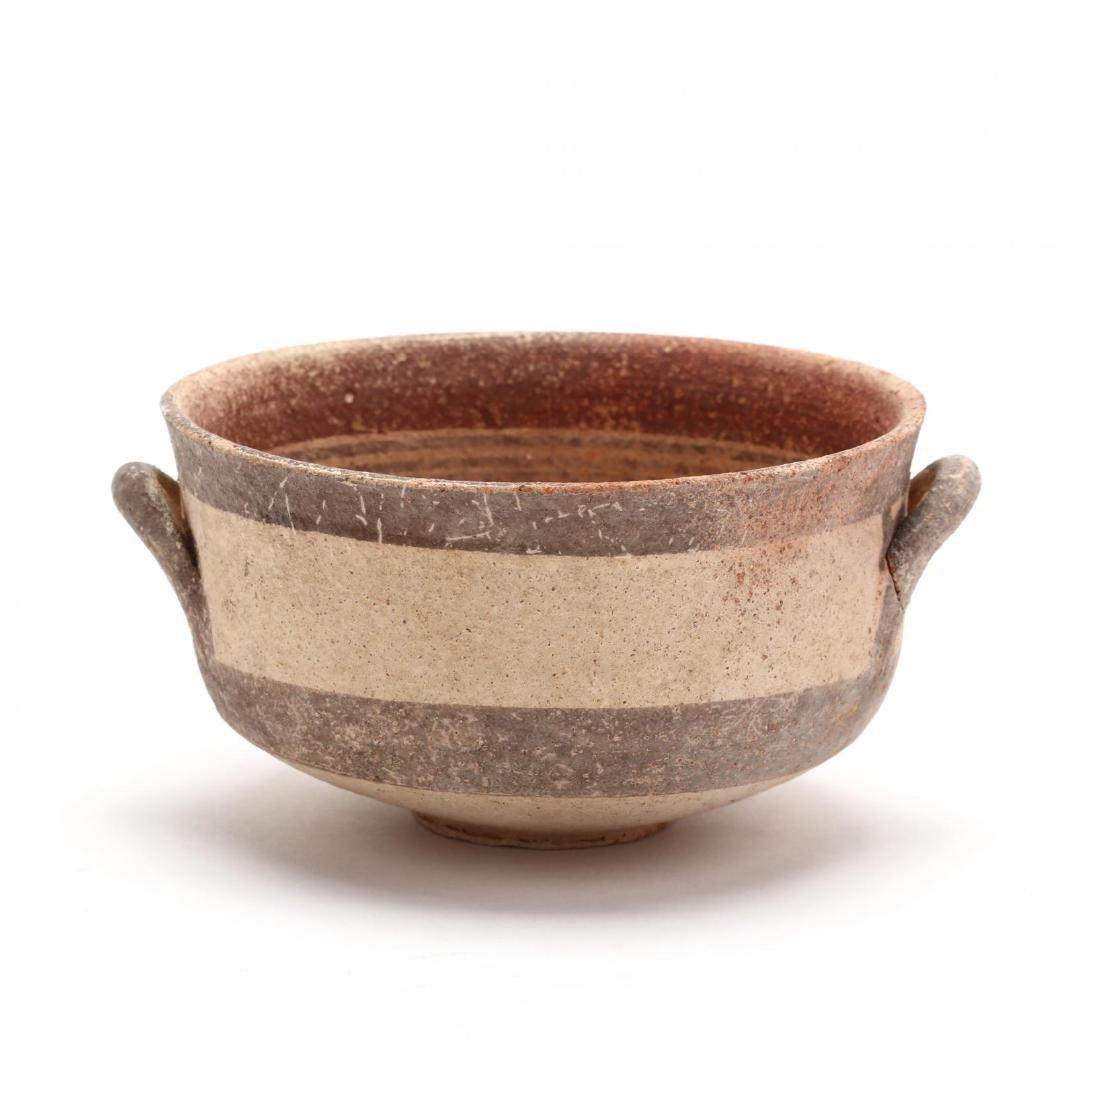 Cypro-Geometric Bowl